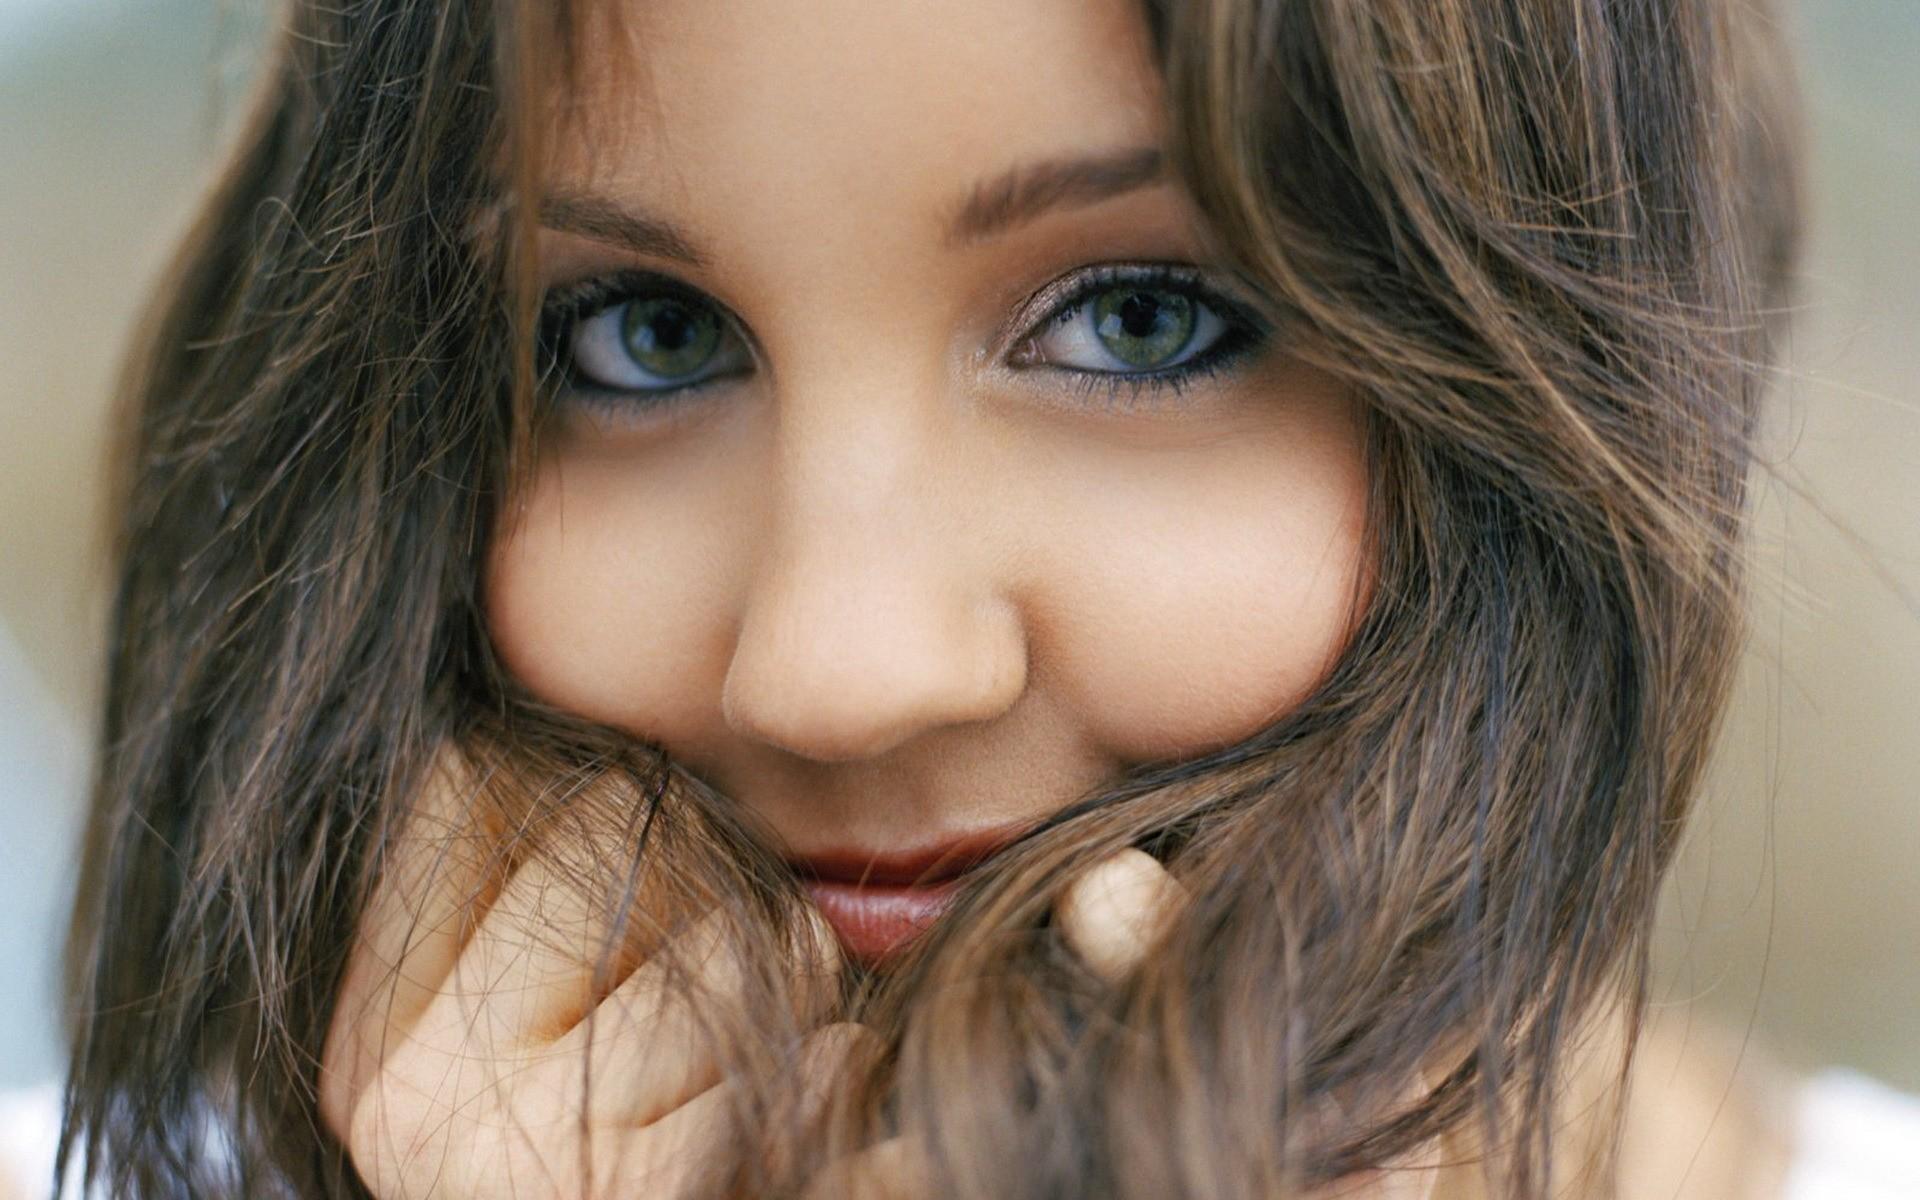 Amanda Bynes rostro hermoso - 1920x1200